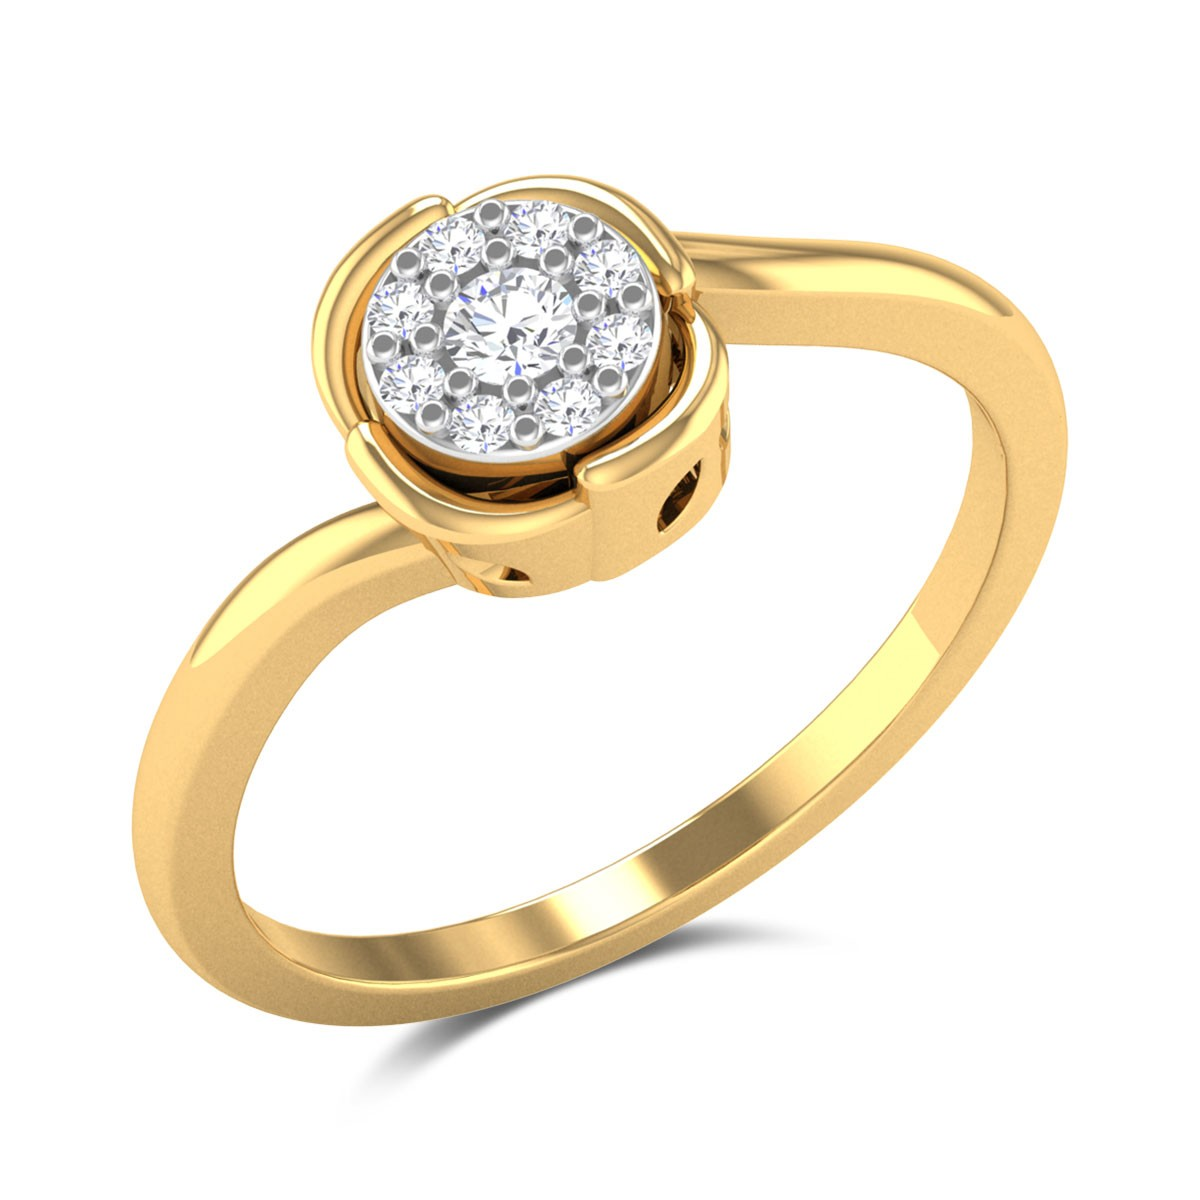 Pamposh Floral Diamond Ring